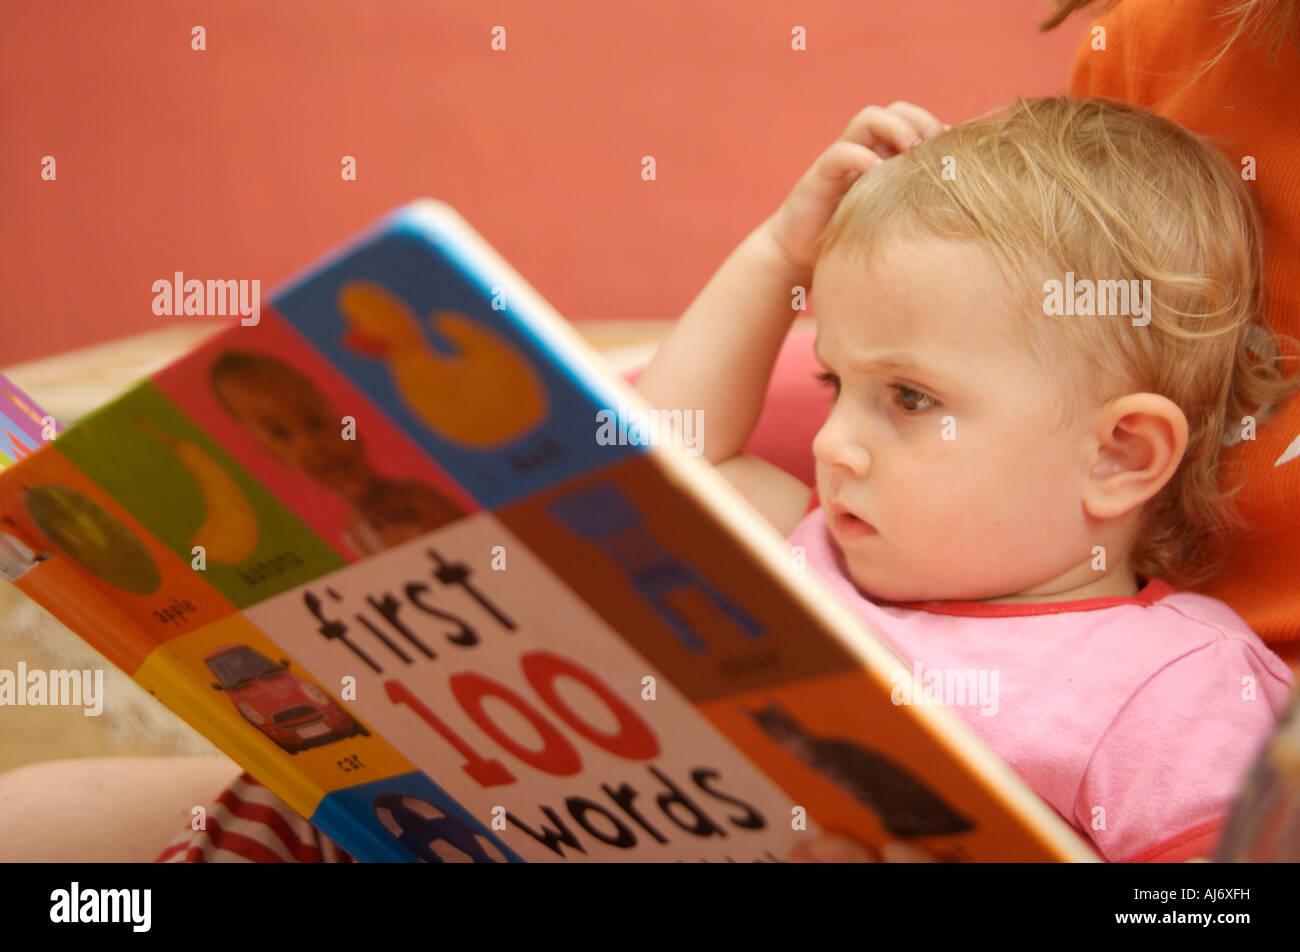 Children learn first kalma pics